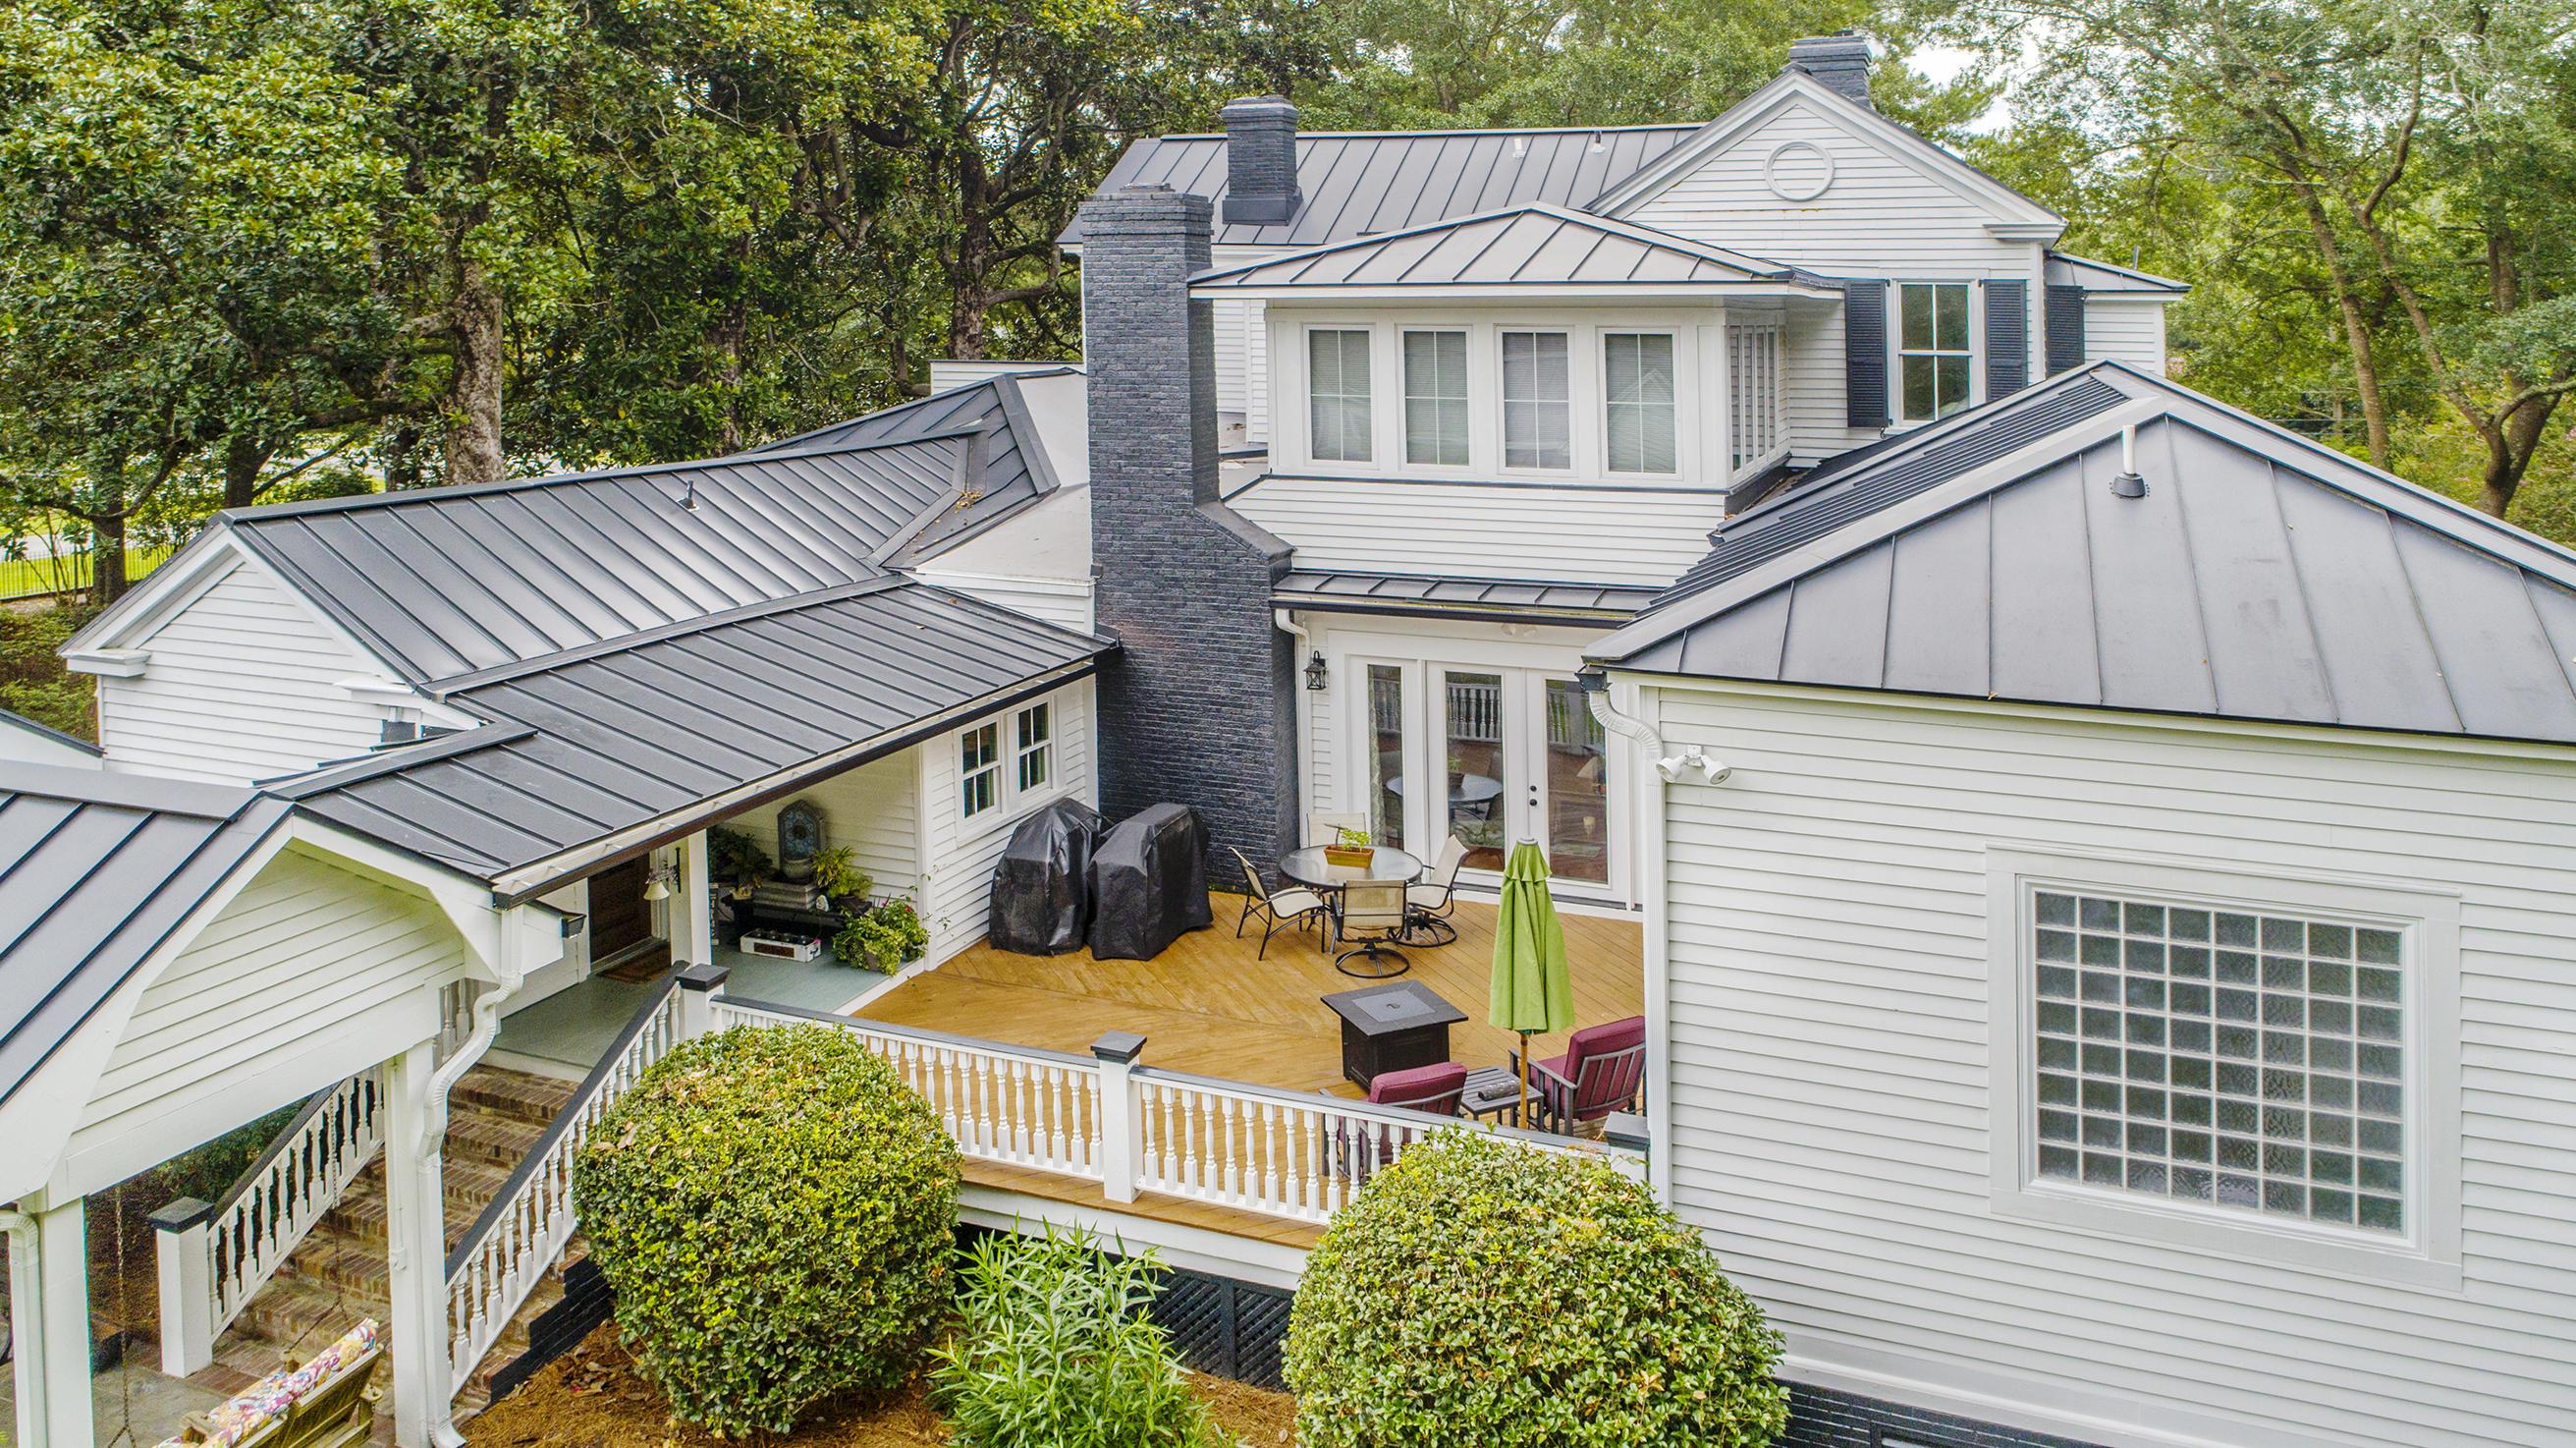 Summerville Homes For Sale - 102 Hickory, Summerville, SC - 107